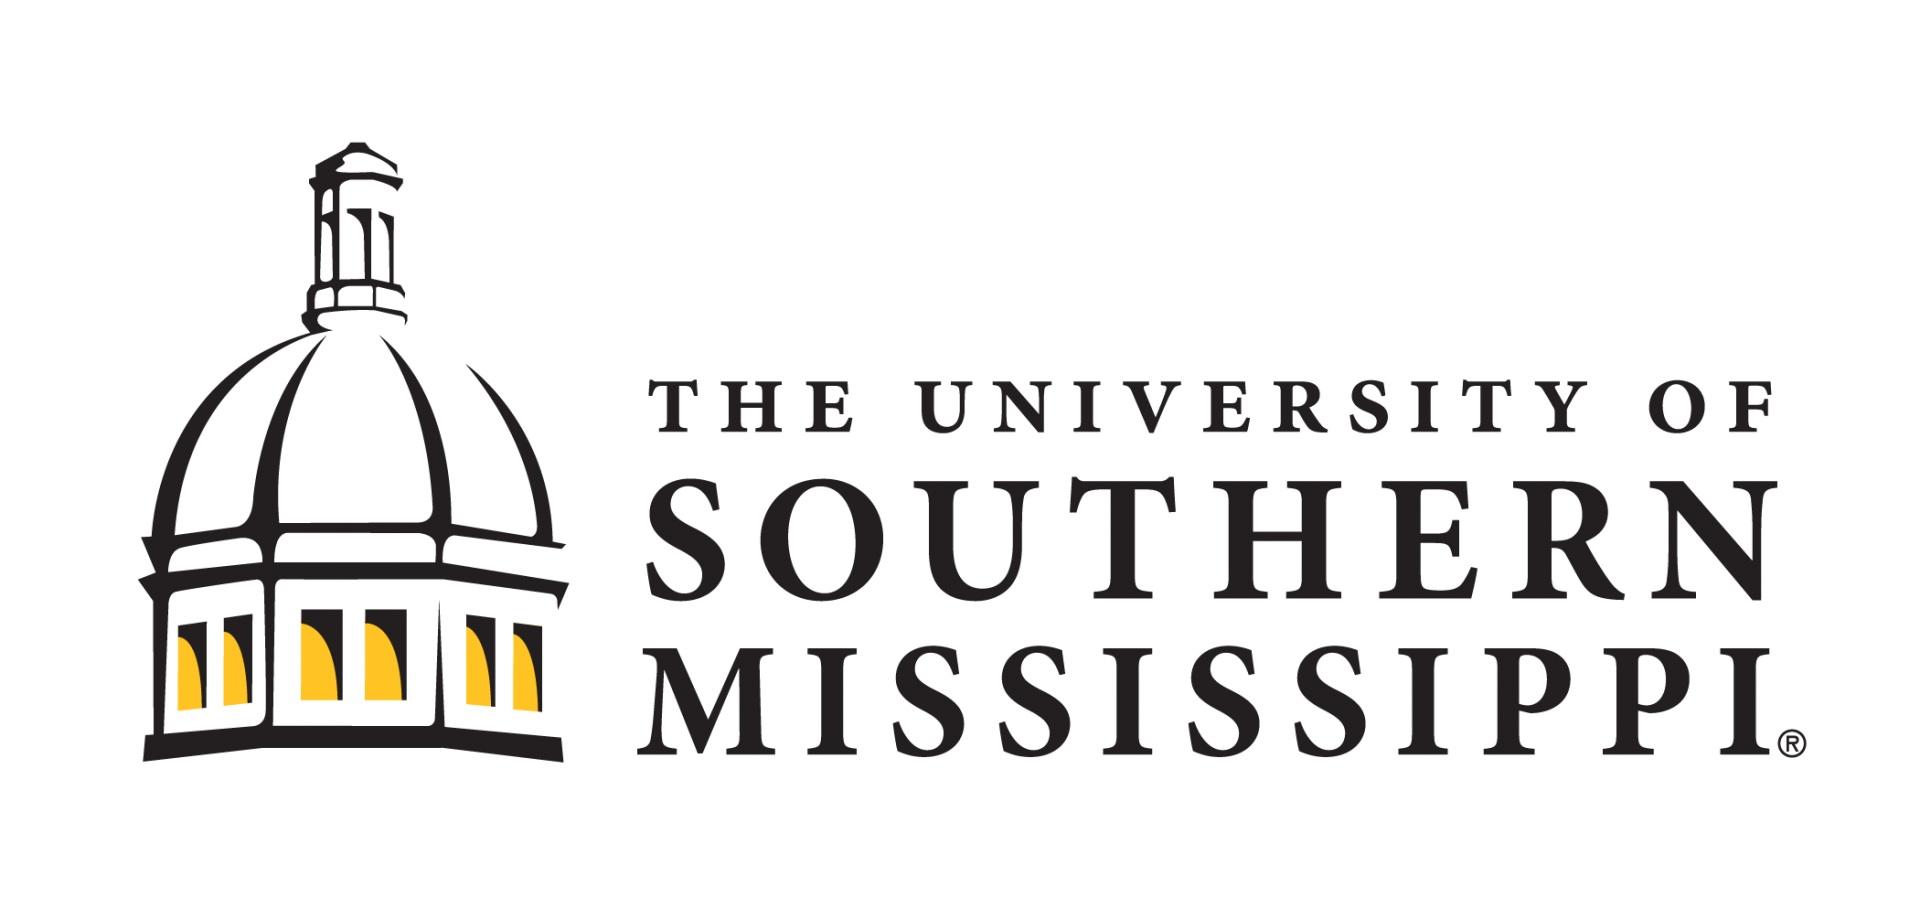 University_of_Southern_Mississippi_logo.jpg